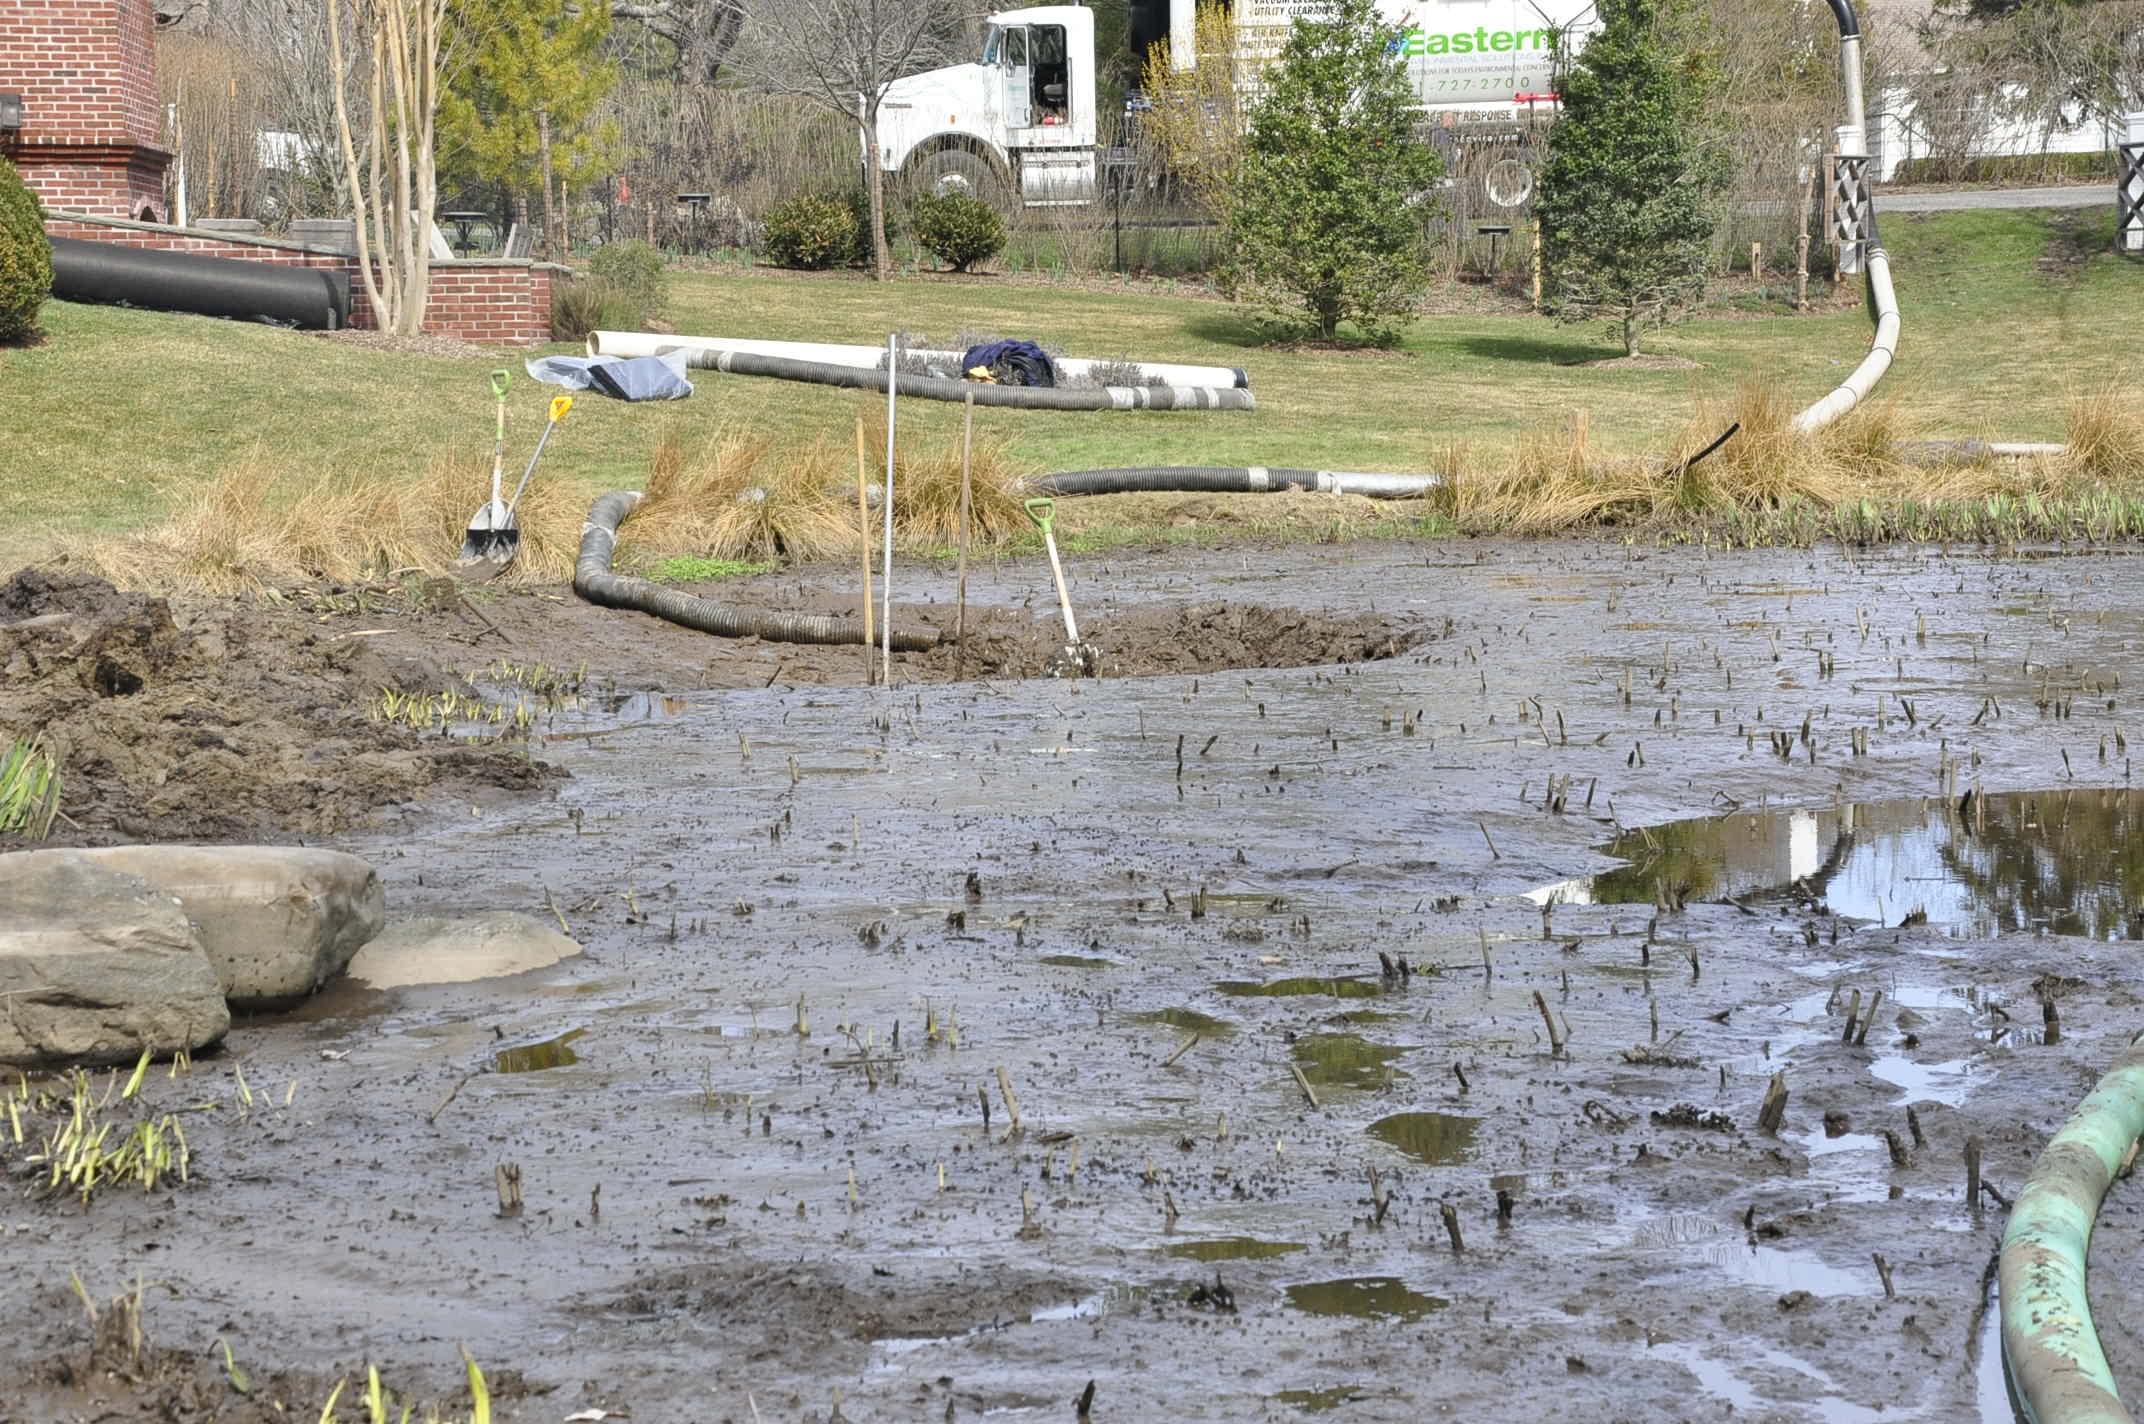 waste pond choice image